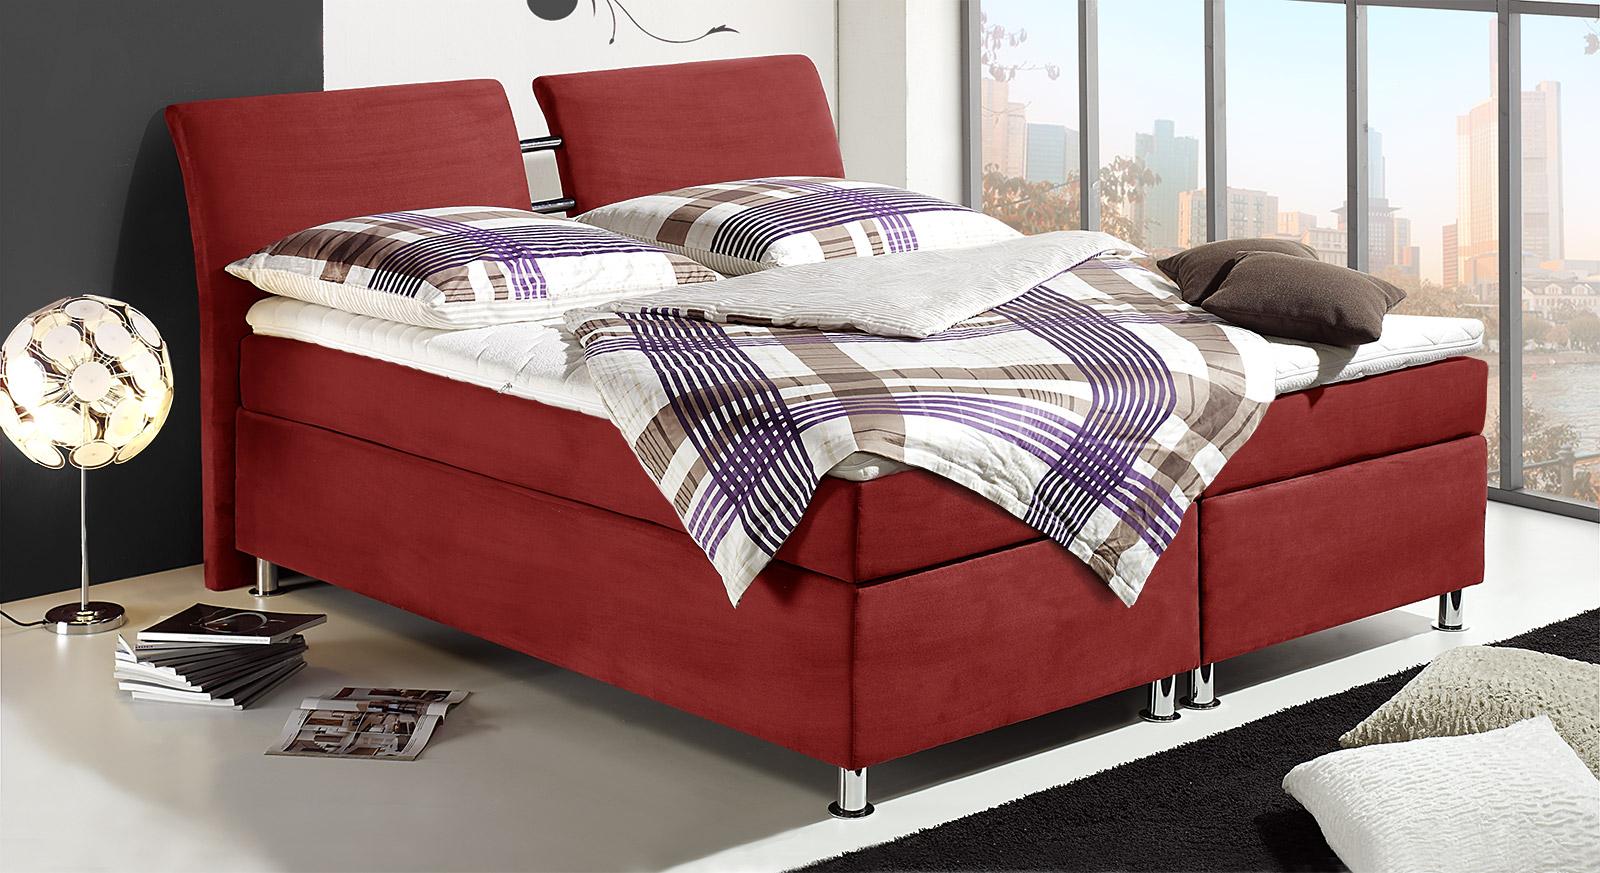 continentalbett mailand mit boxspringsystem und veloursbezug. Black Bedroom Furniture Sets. Home Design Ideas